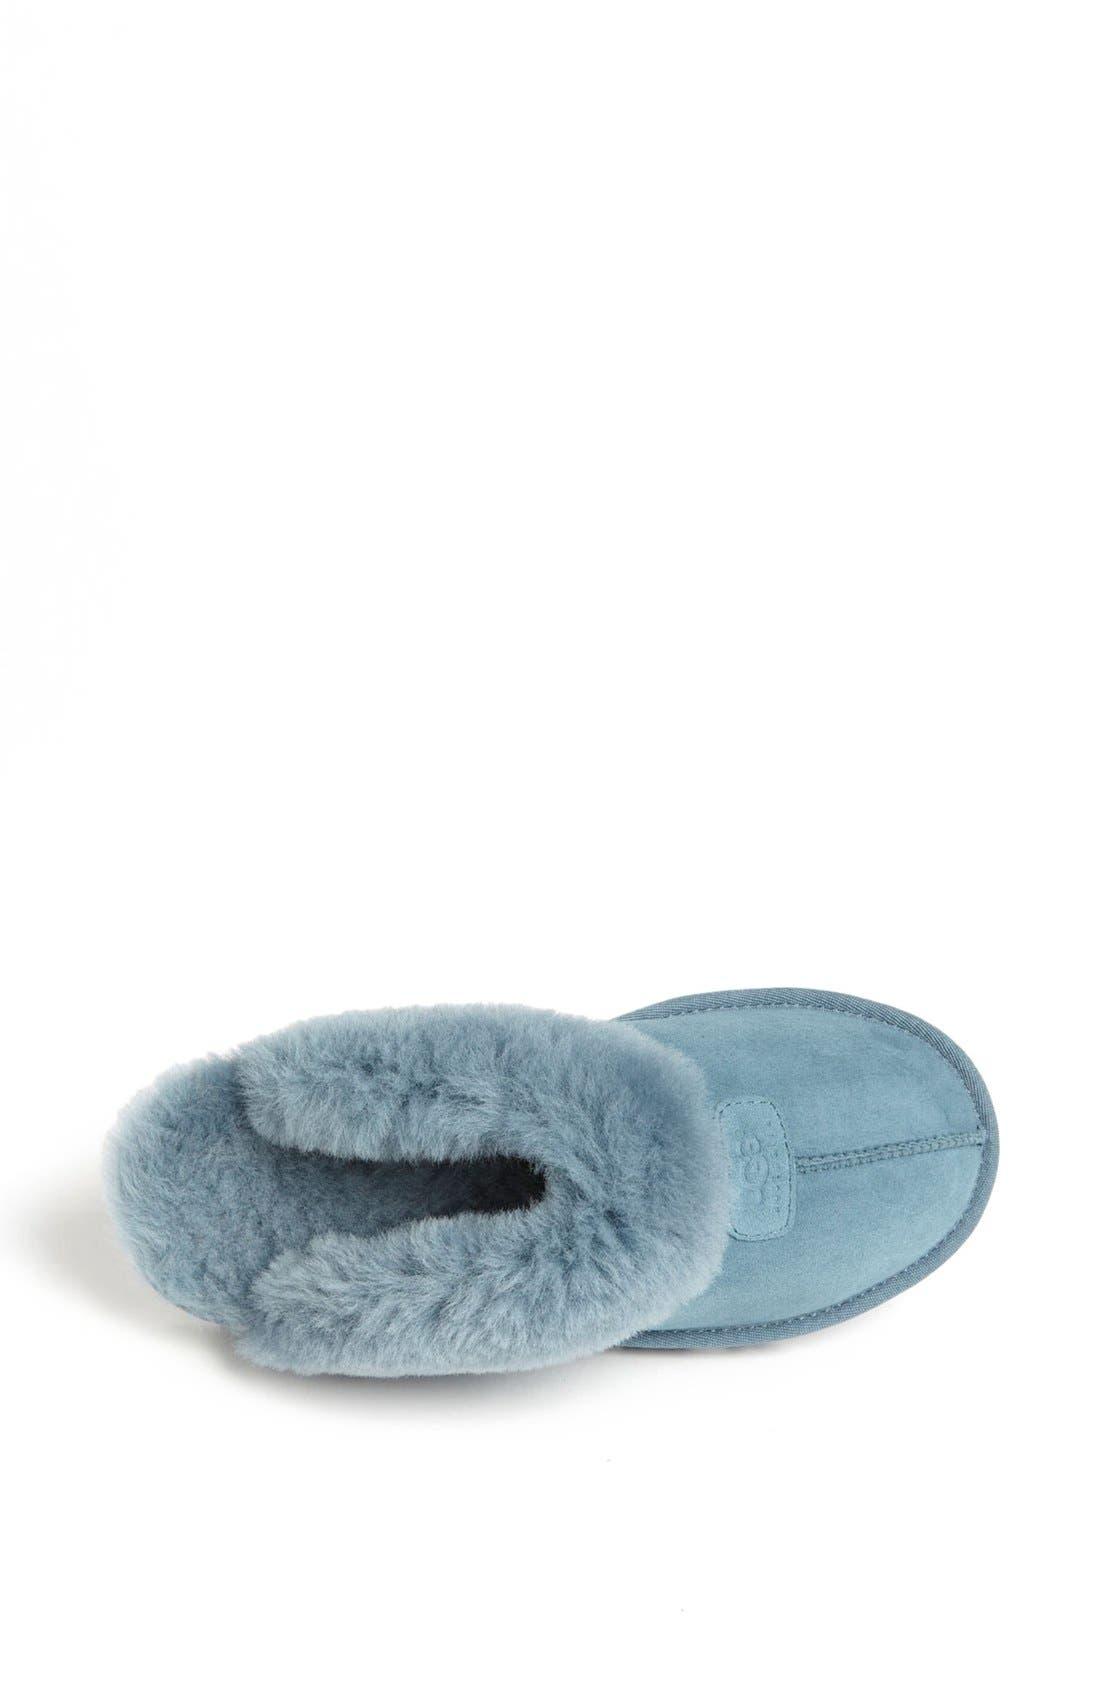 Alternate Image 3  - UGG® Australia Slipper (Women) (Exclusive Color)